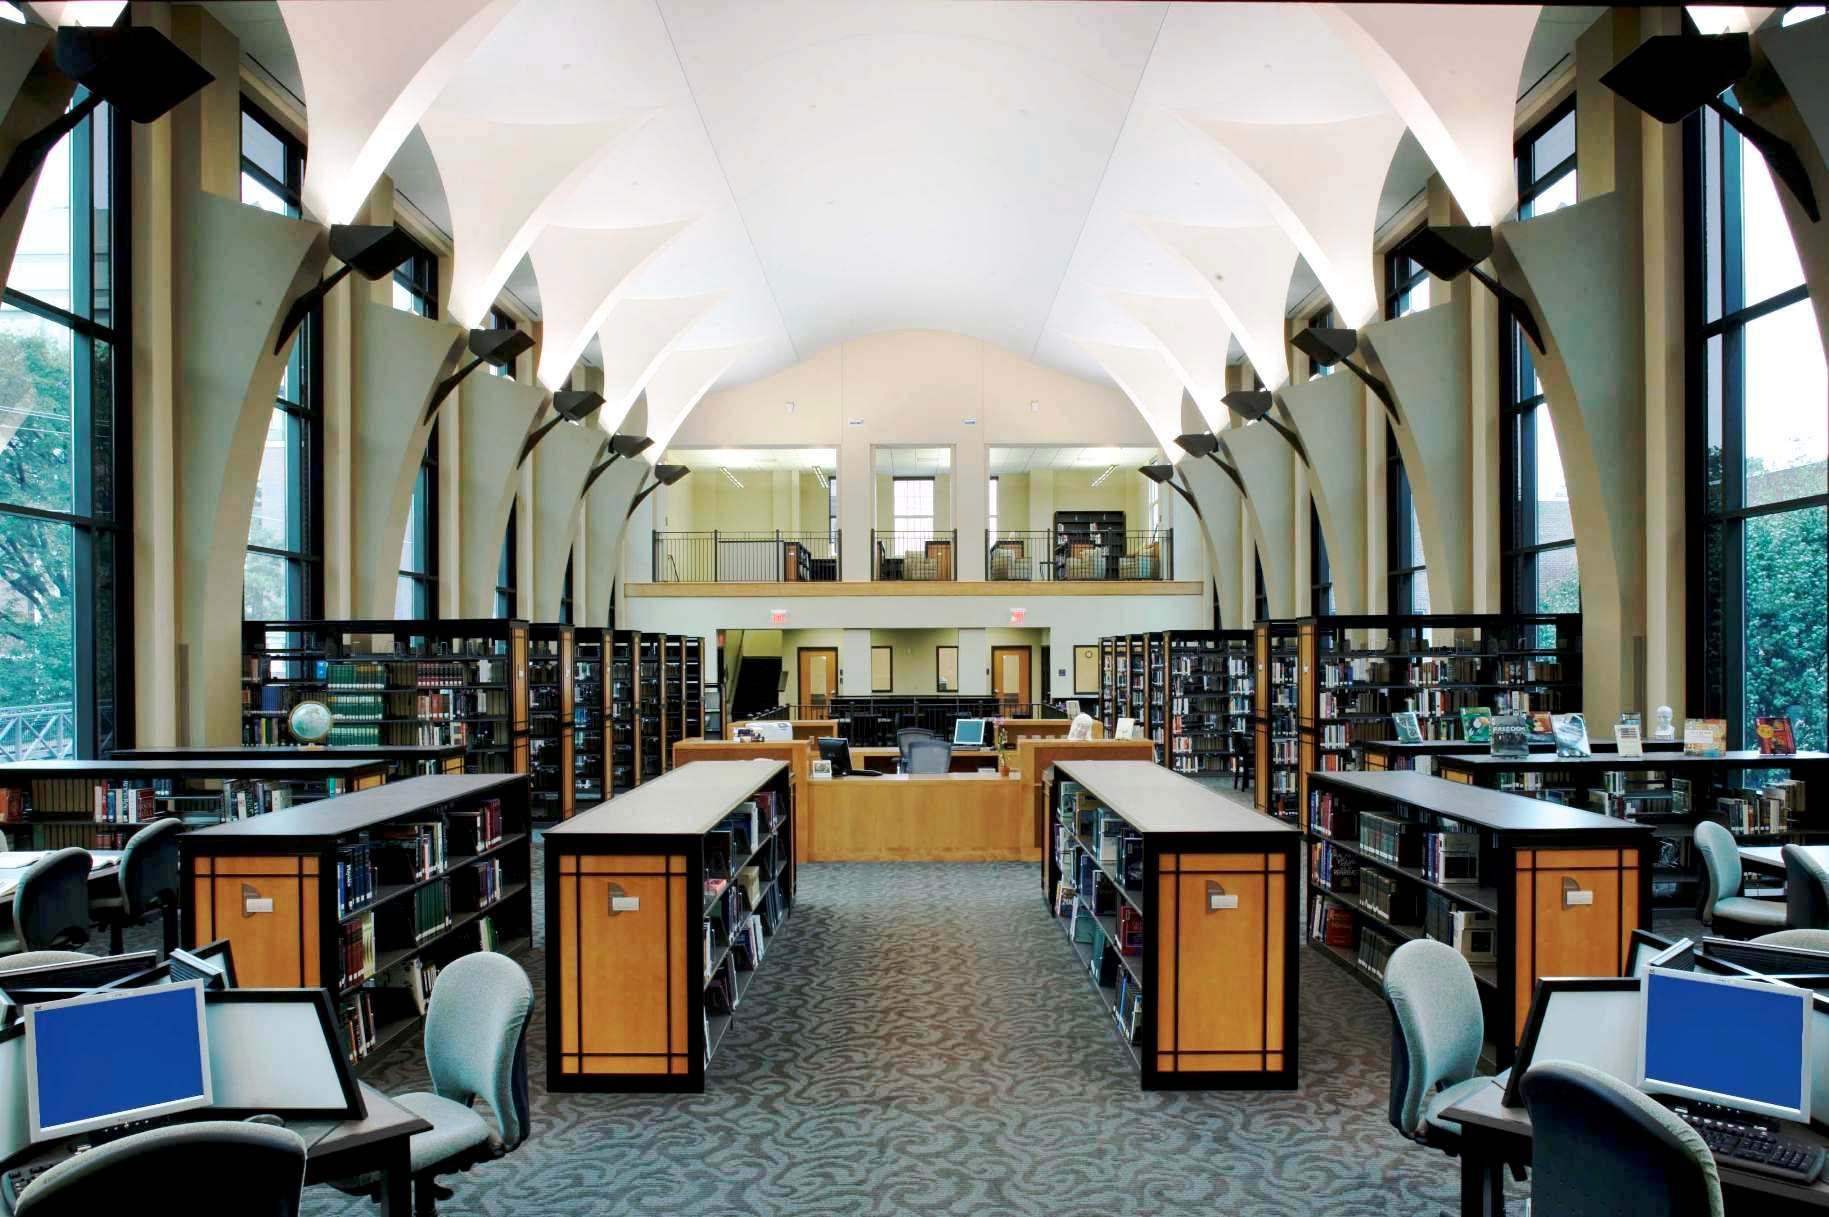 Univ School Of Nashville Anderson Design Studio Interior Design